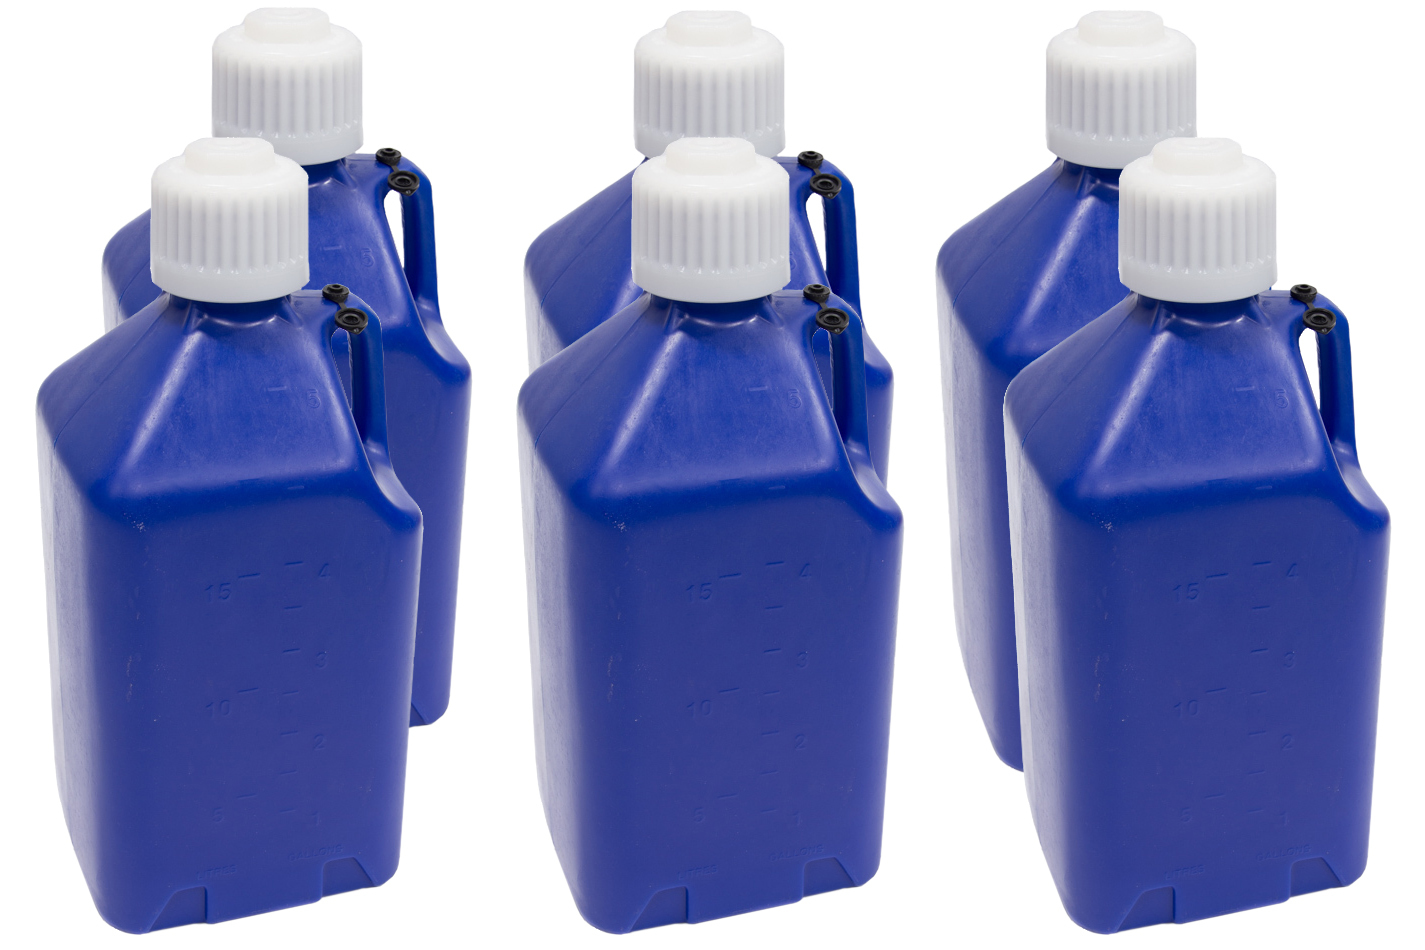 Scribner Utility Jug - 5-Gallon Dark Blue - Case 6